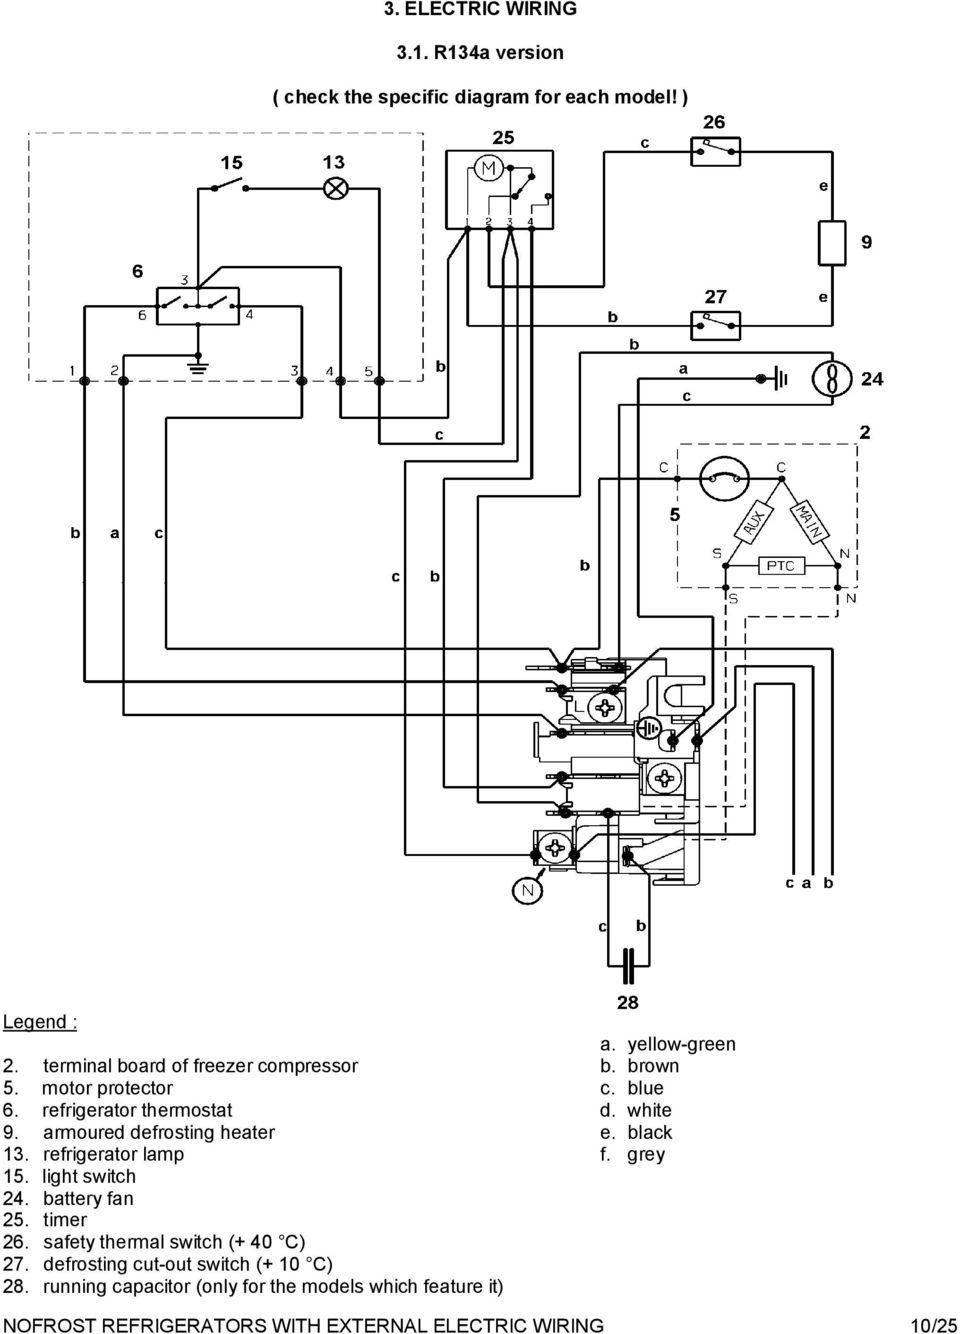 hight resolution of armoured defrosting heater e black 13 refrigerator lamp f grey 15 light